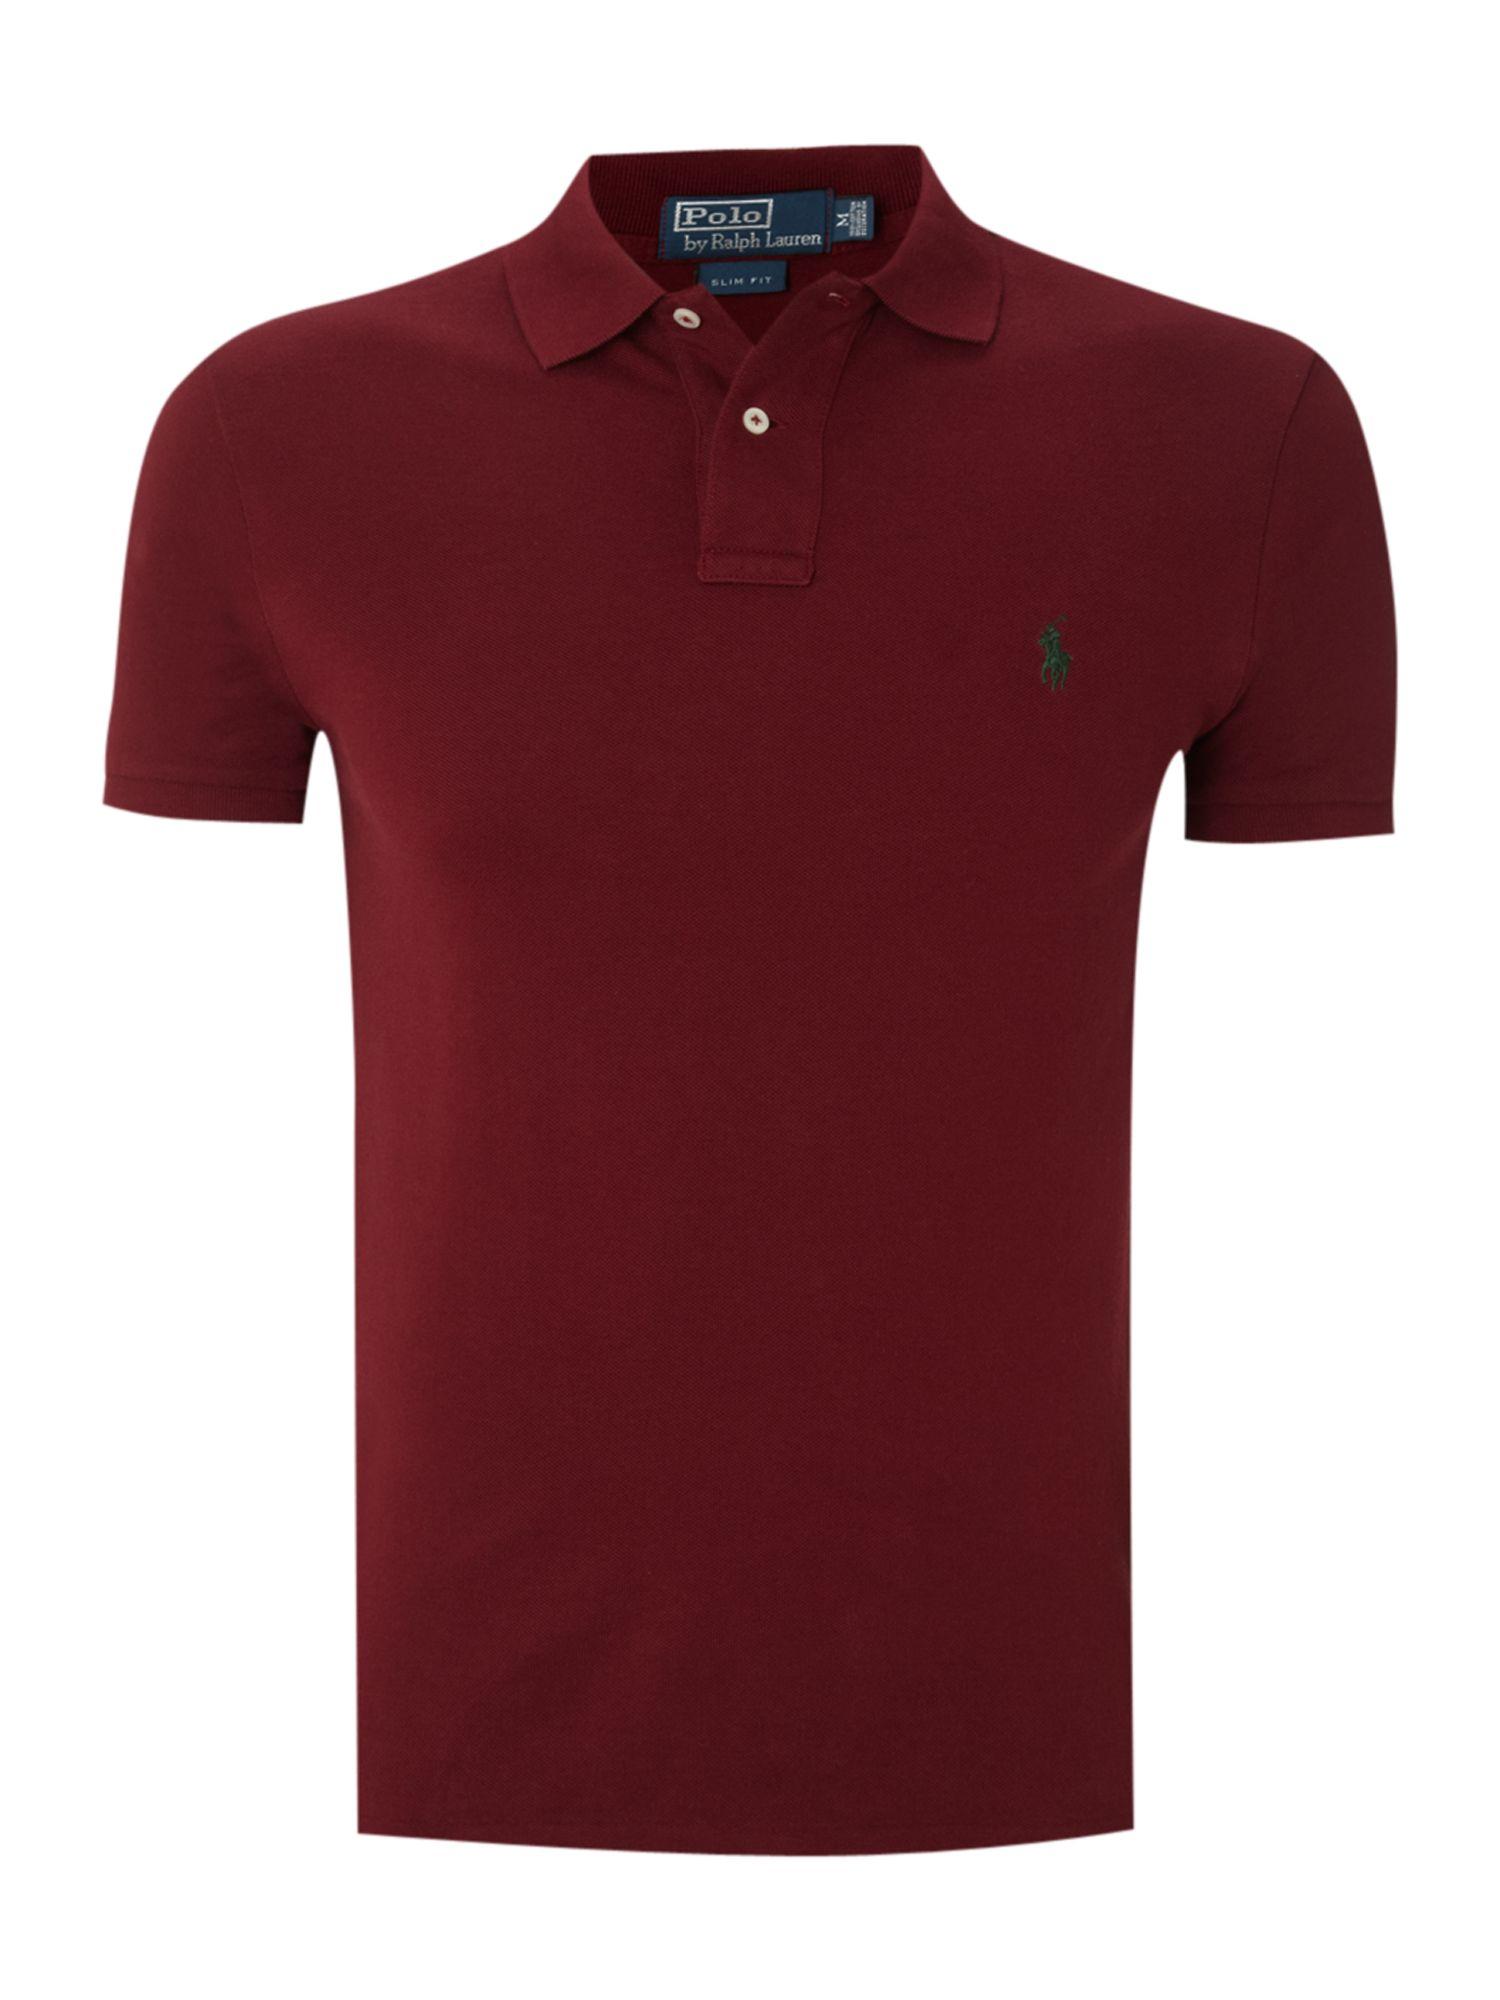 Mens Short Sleeve Work Shirts